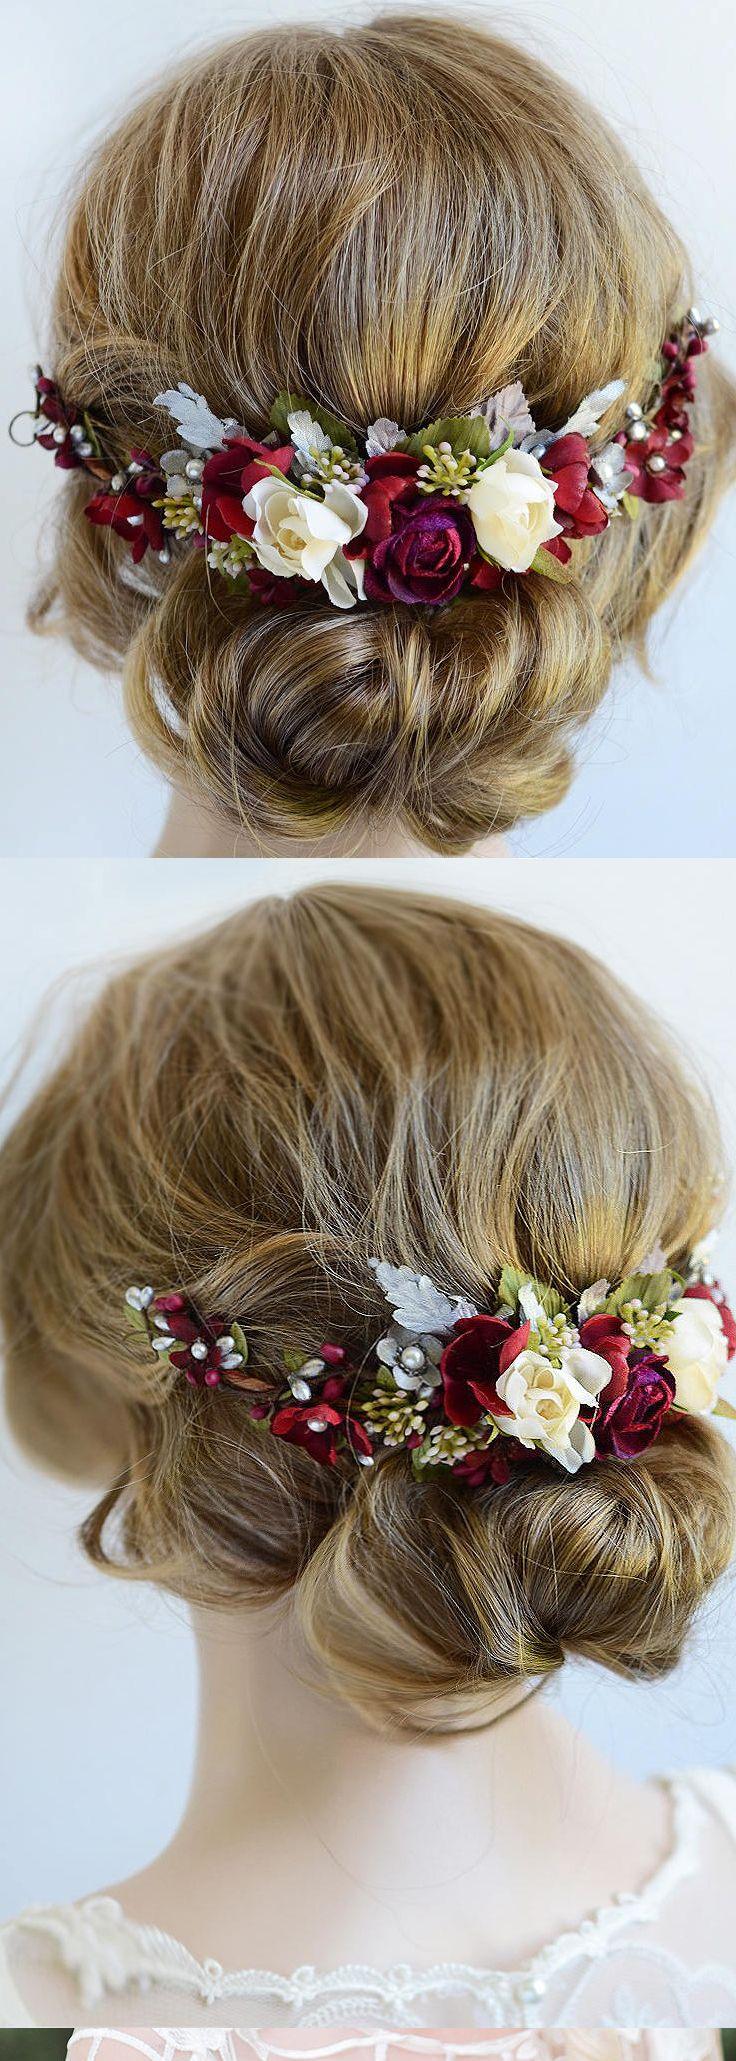 Maroon and cream wedding decor  Christmas Wedding Bridal Fascinator Floral headpiece in burgundy